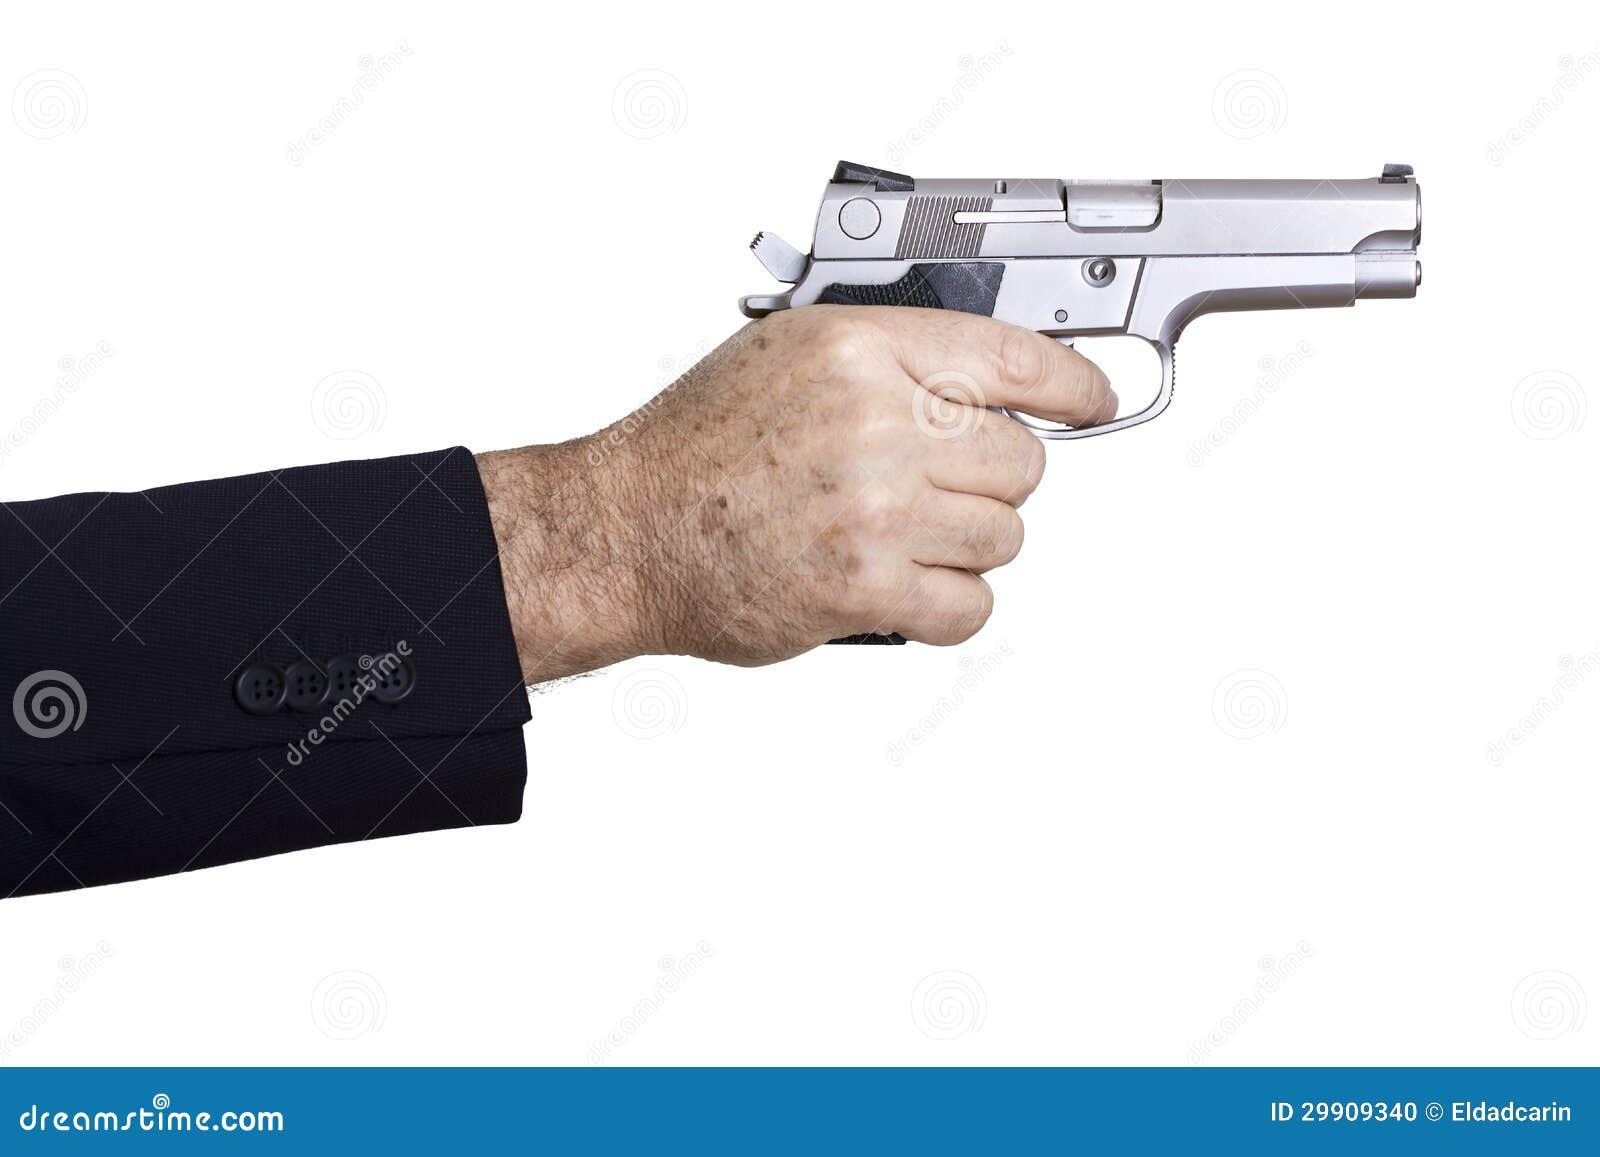 Aiming The Gun Stock Photo - Image: 29909340